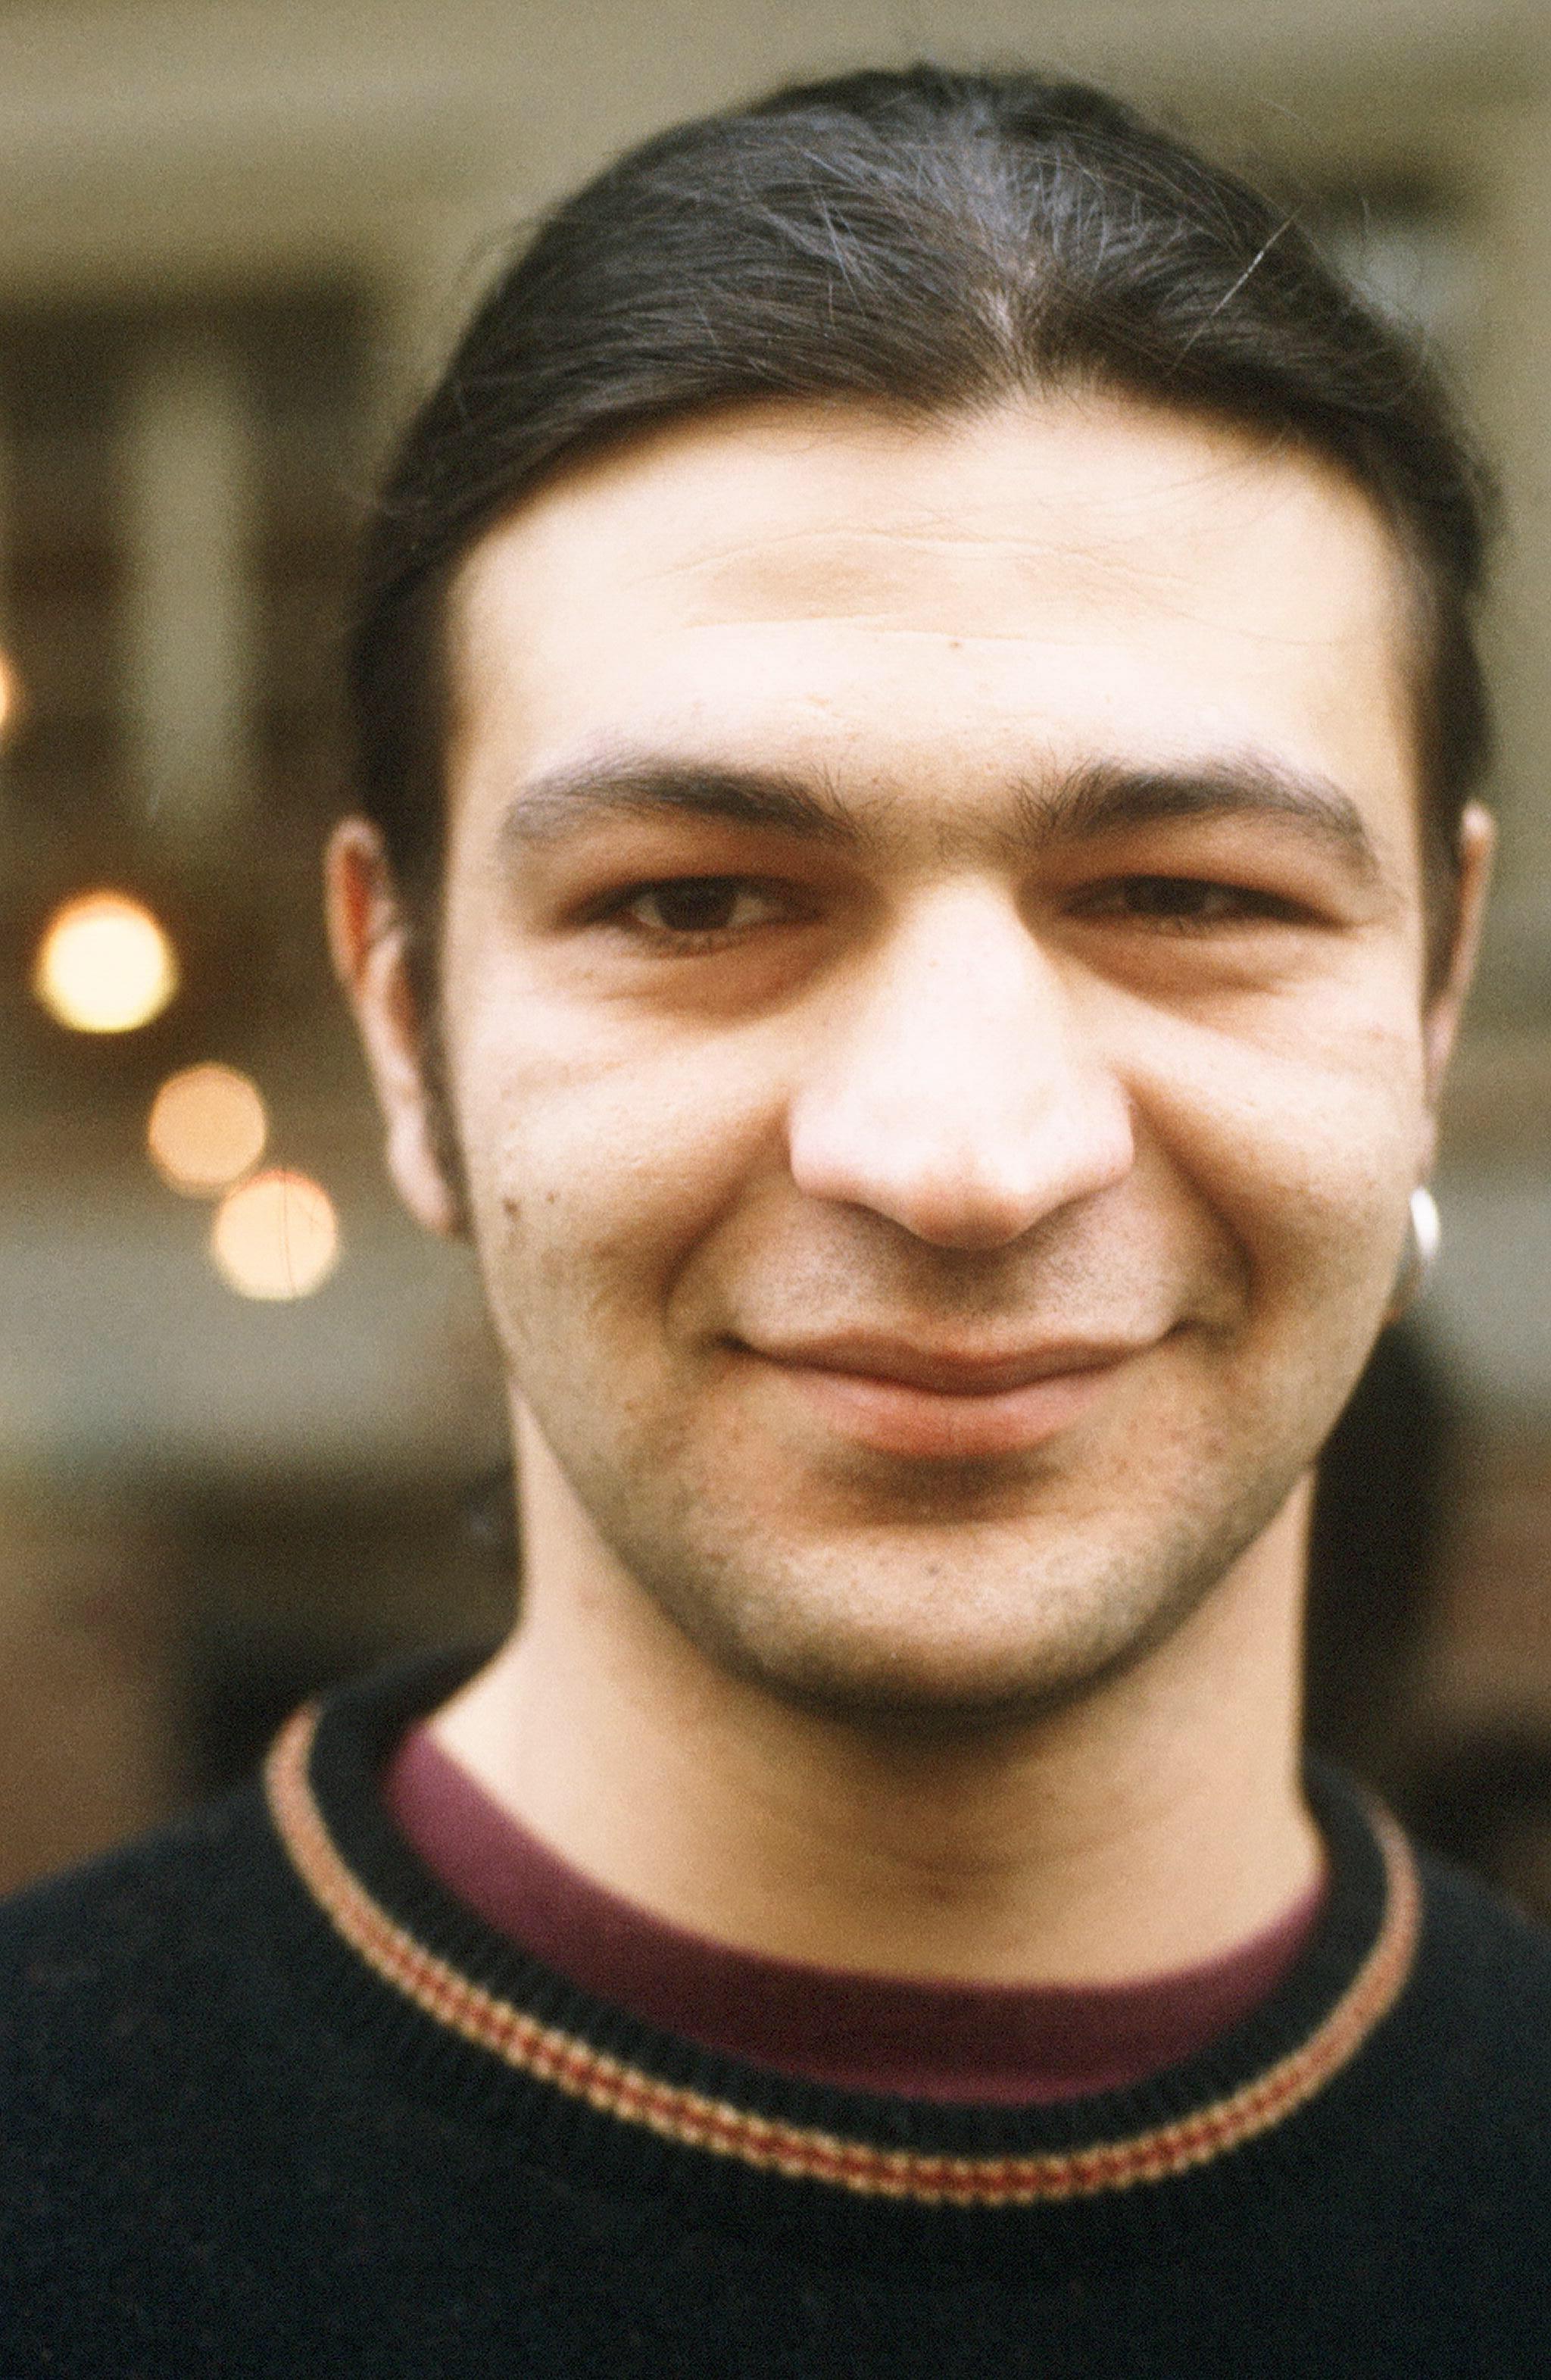 Arnaud Rebotini (Zend Avesta) (FR), rue de Charonne, Paris, 1997 09920094 Olivier Degorce - Plastic Dreams - Headbangers Publishing